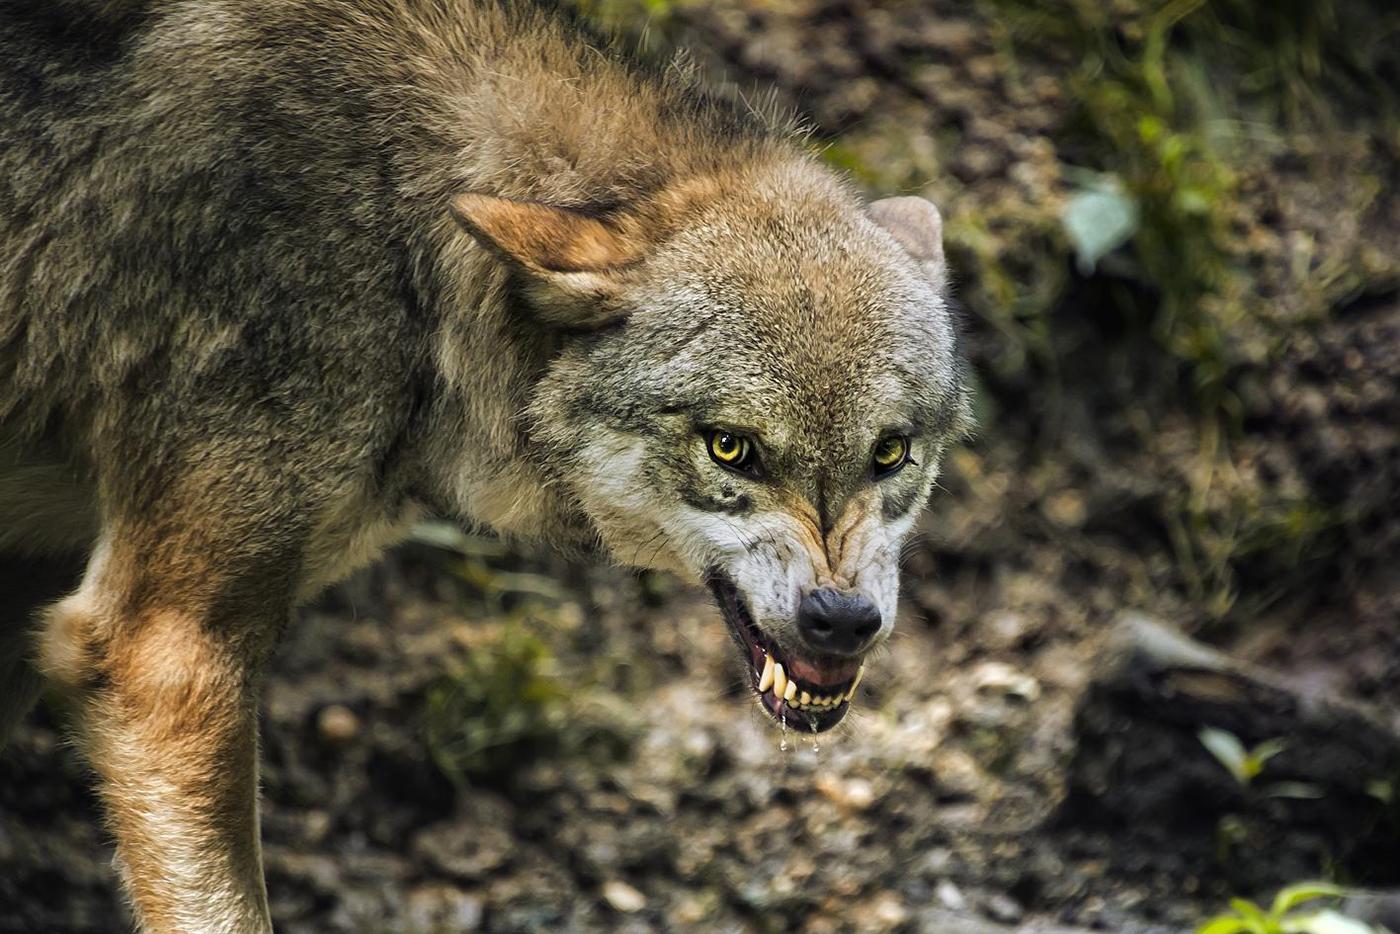 Bajorų kaime vilkai surengė skerdynes